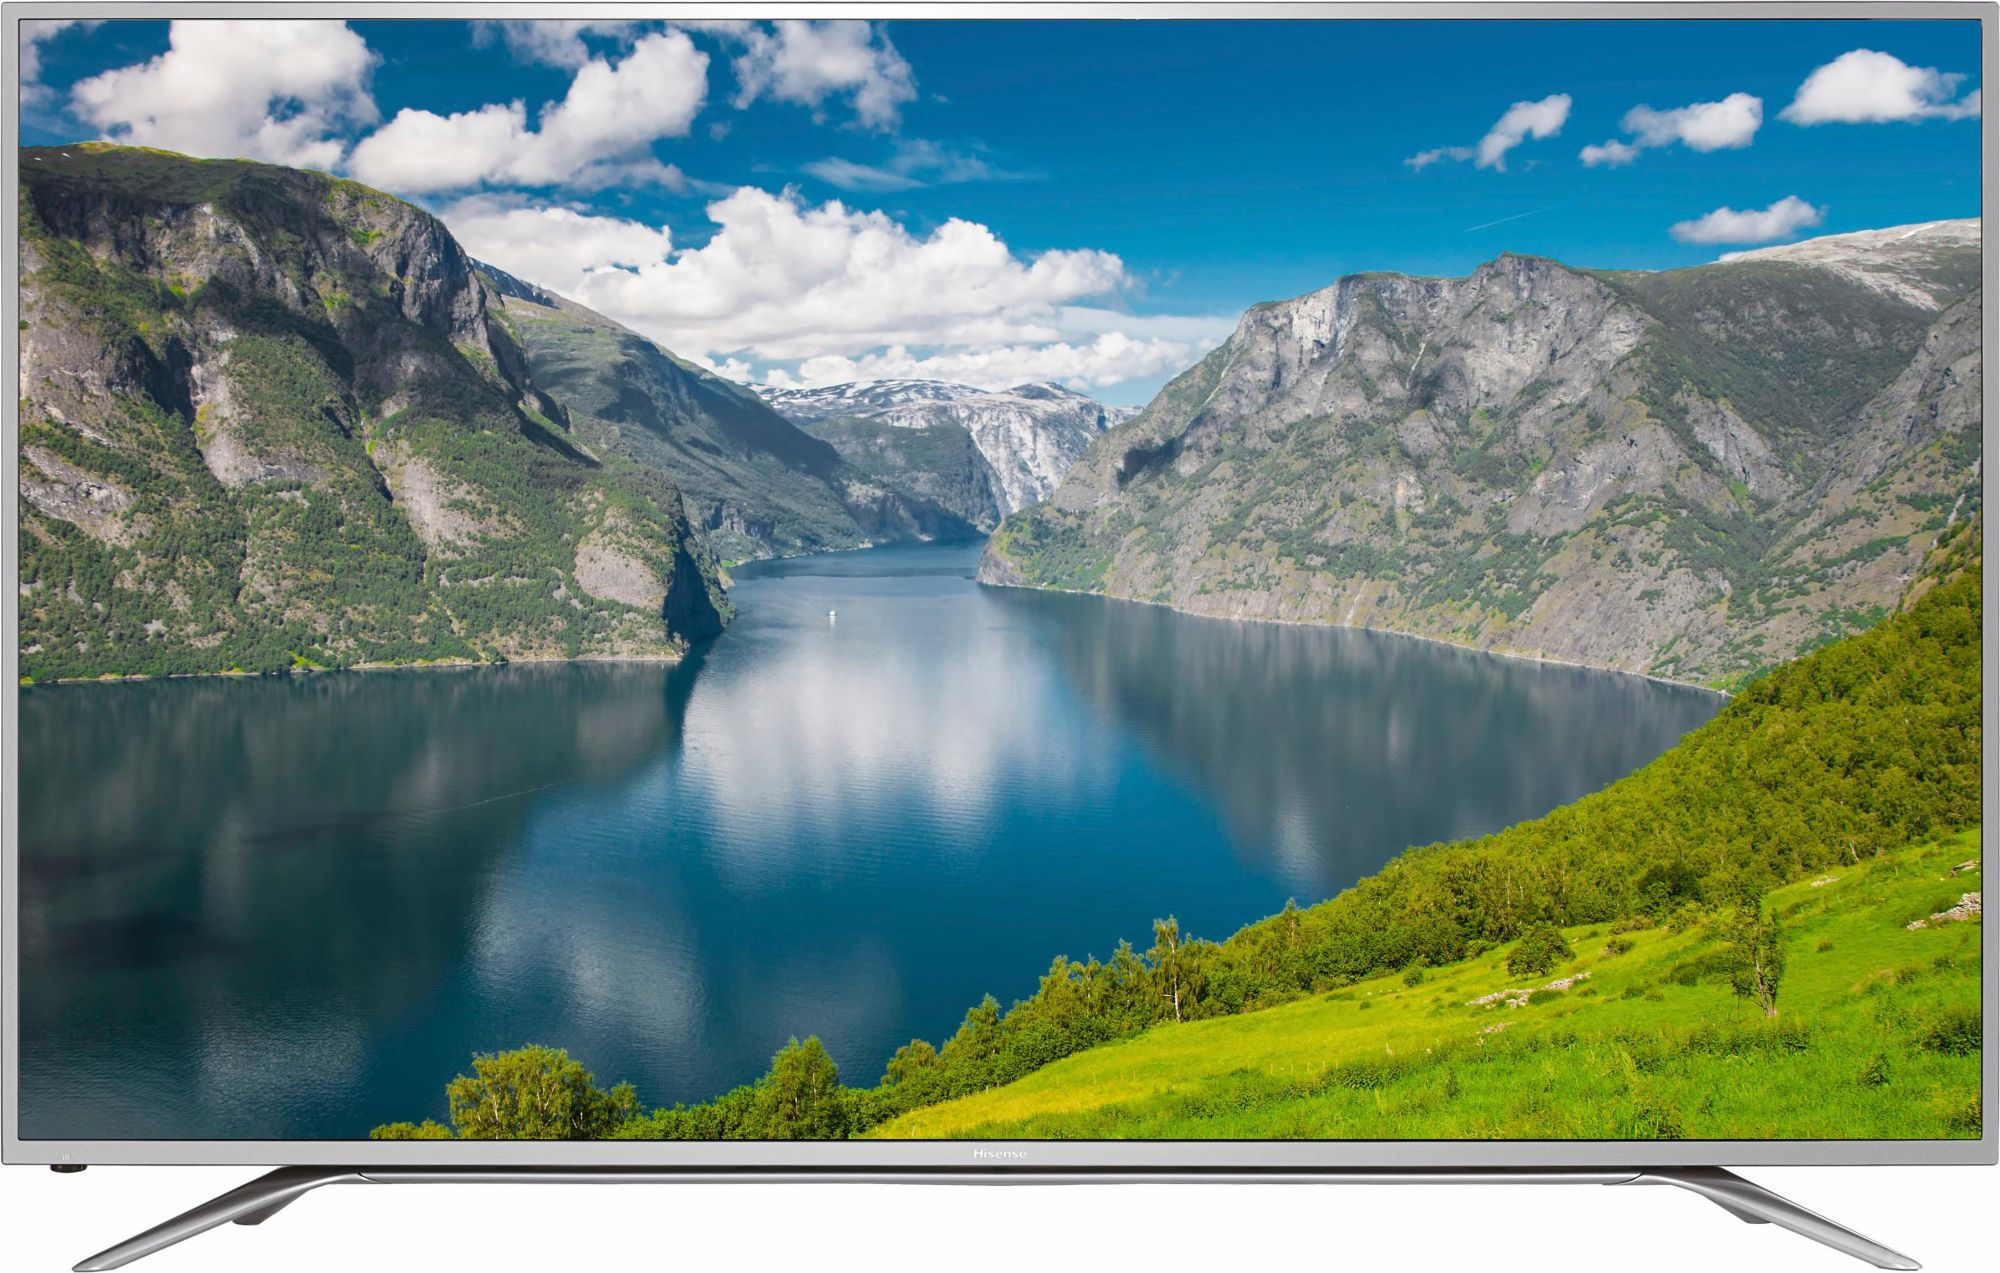 HISENSE Hisense H65MEC5550, LED Fernseher, 163 cm (65 Zoll), 2160p (4K Ultra HD), Smart-TV